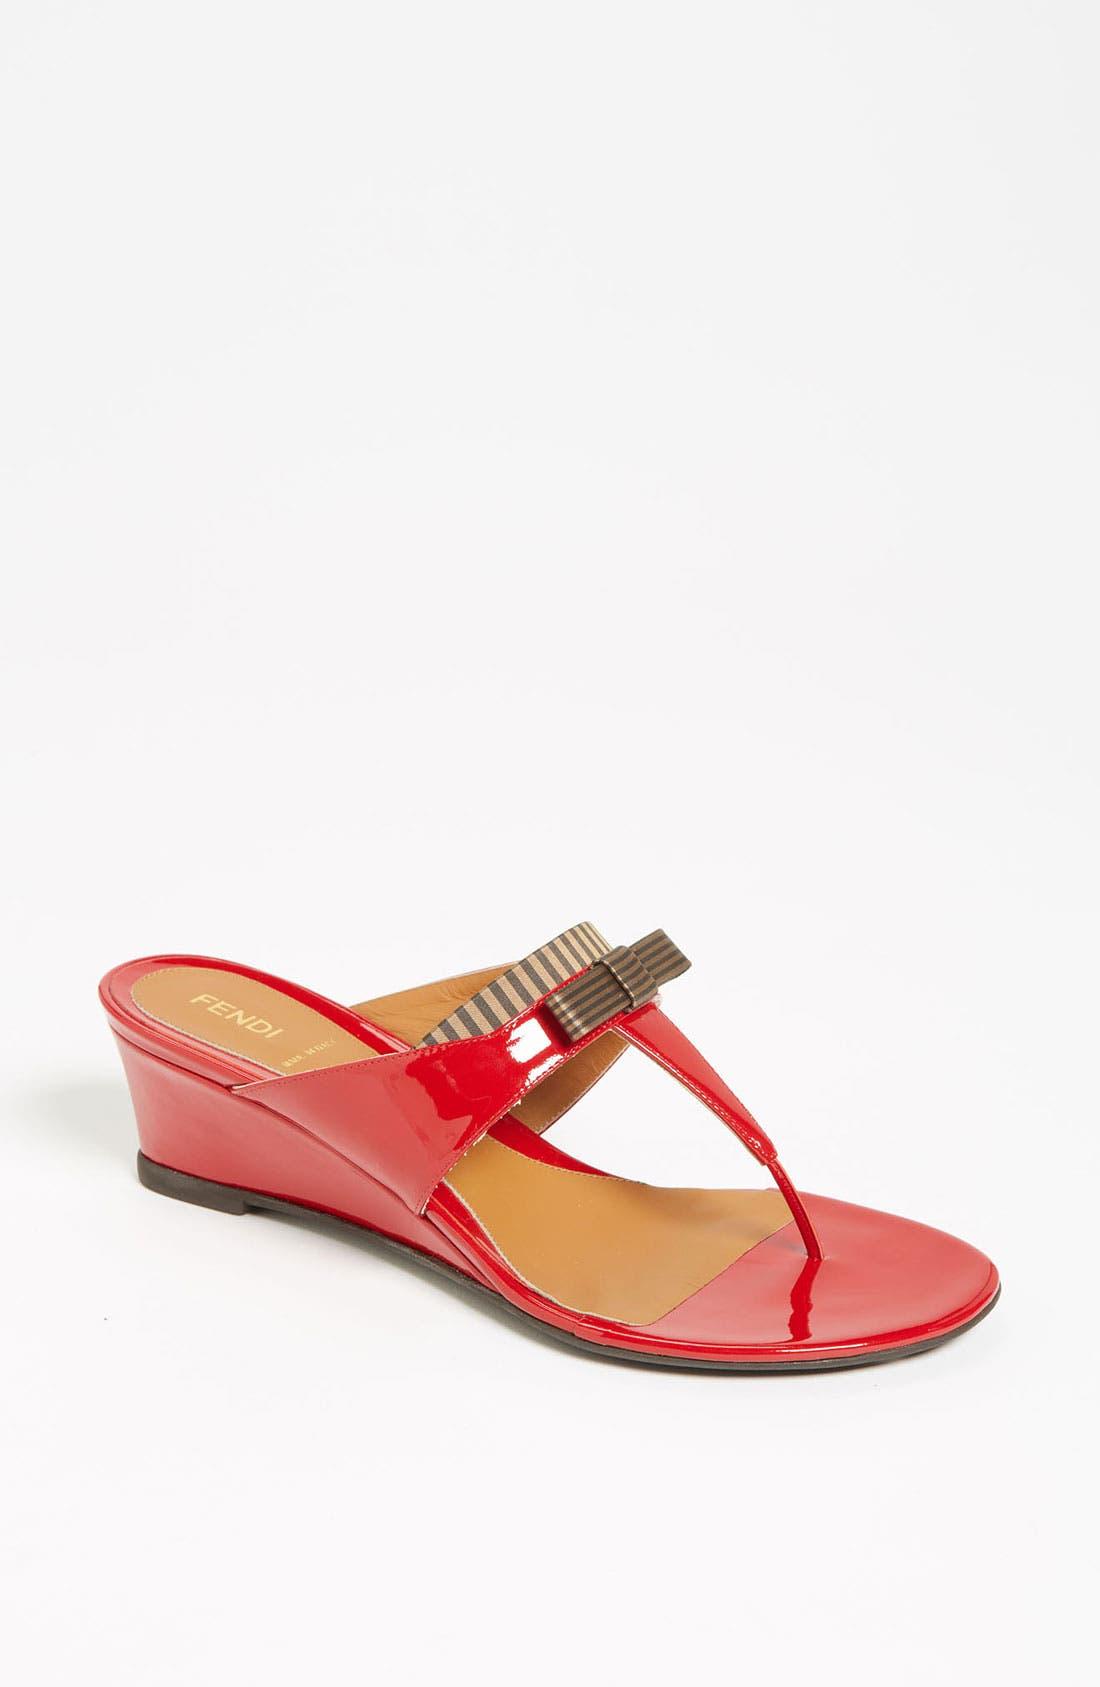 Alternate Image 1 Selected - Fendi 'Charleston' Thong Sandal